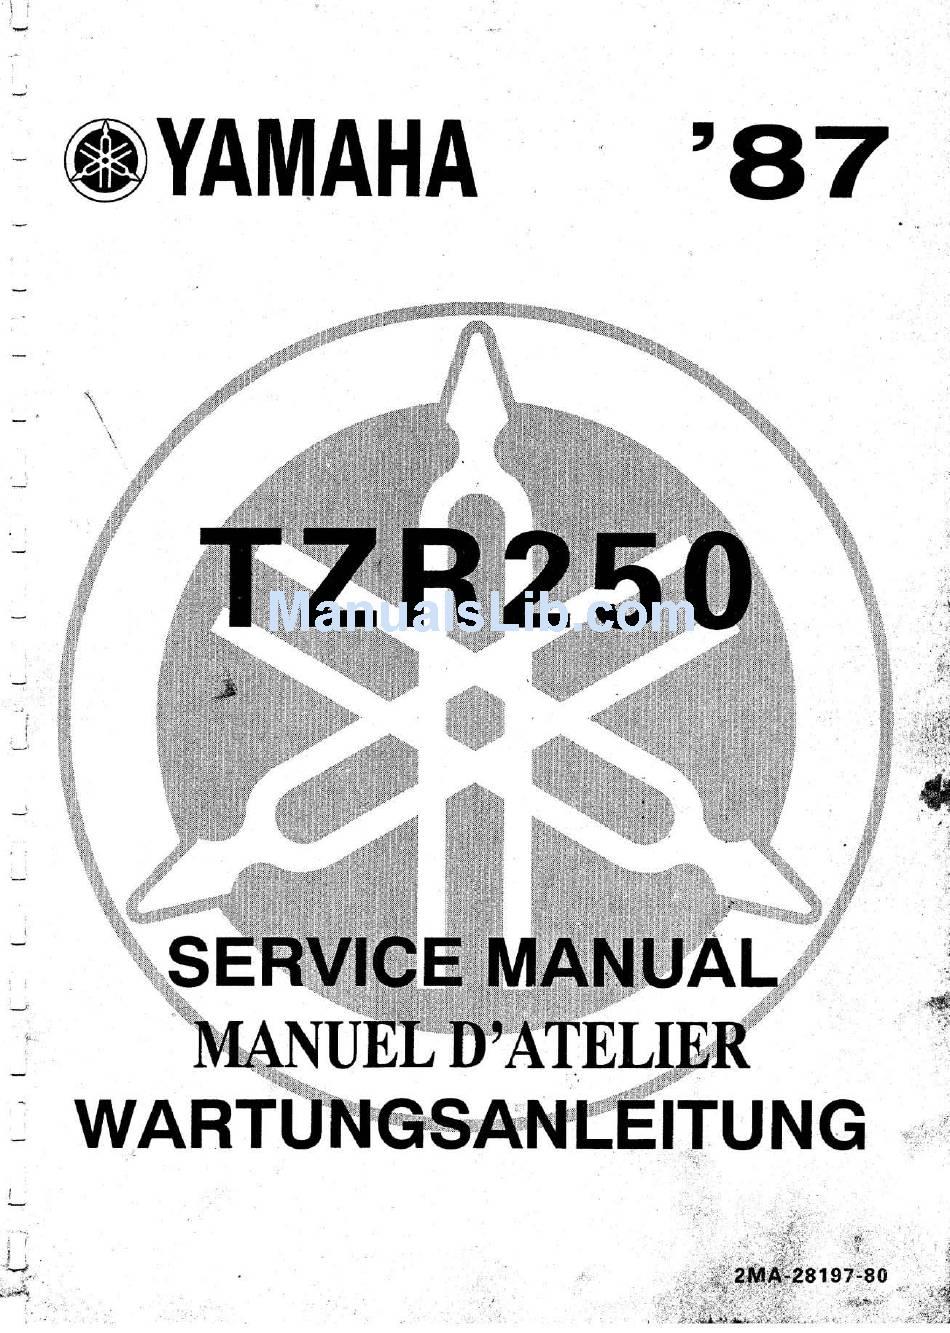 Yamaha Tzr250 1987 Service Manual Pdf Download Manualslib